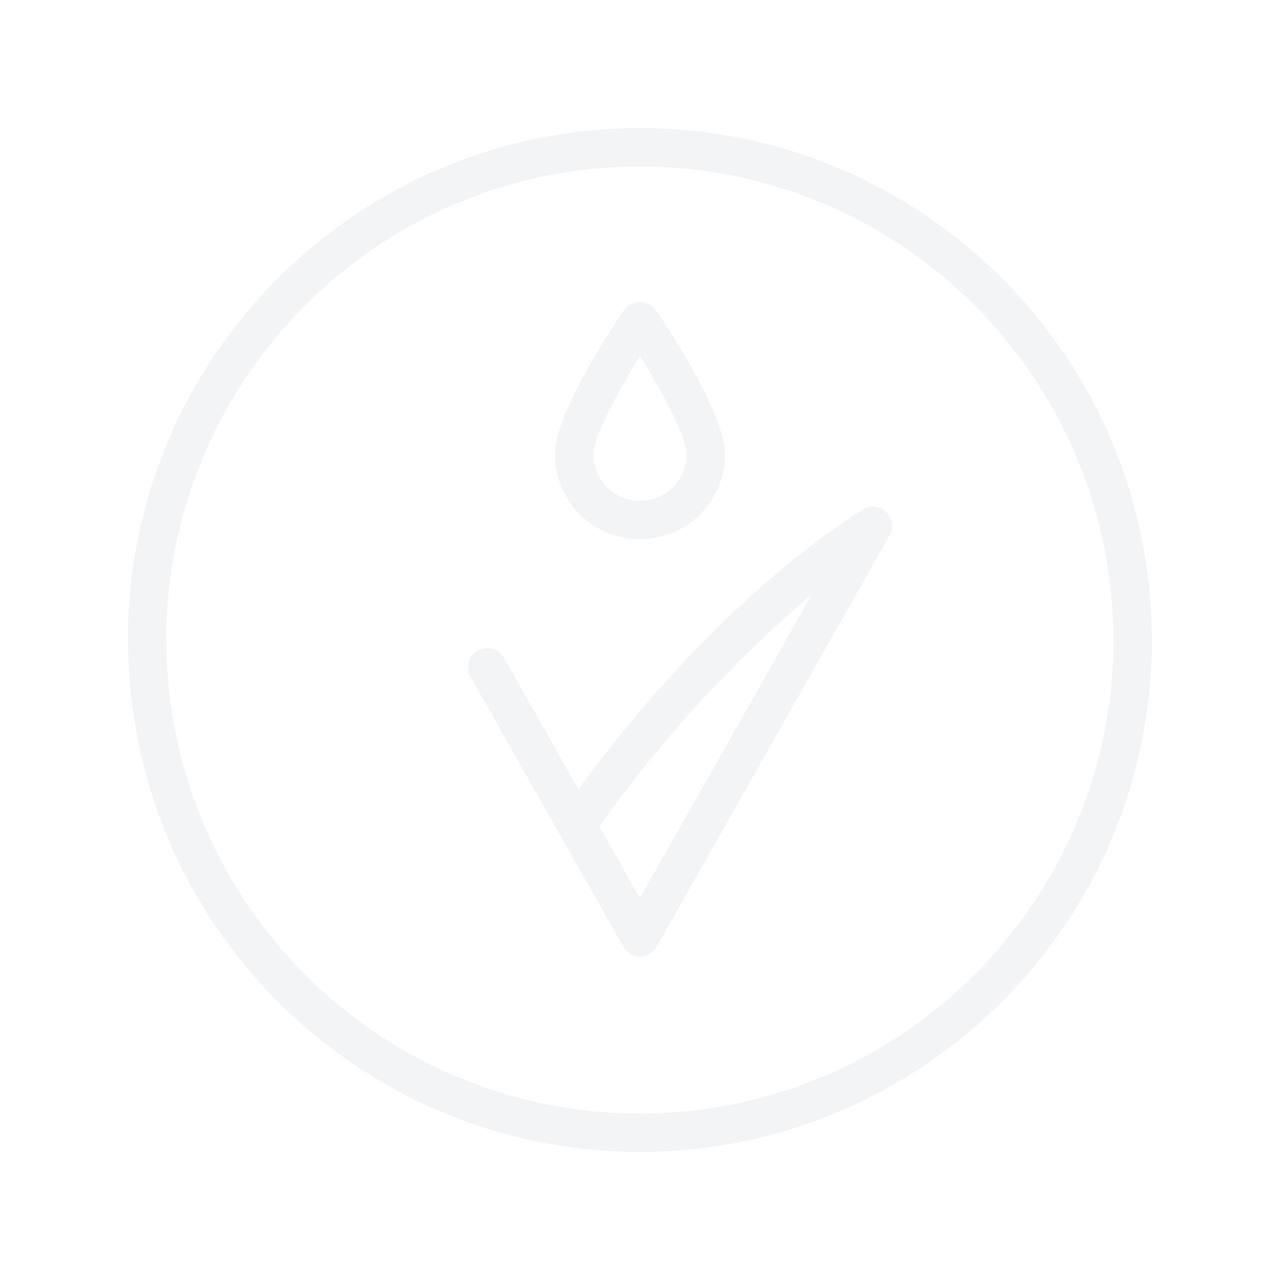 HUGO BOSS The Scent For Her 50ml Eau De Parfum Gift Set